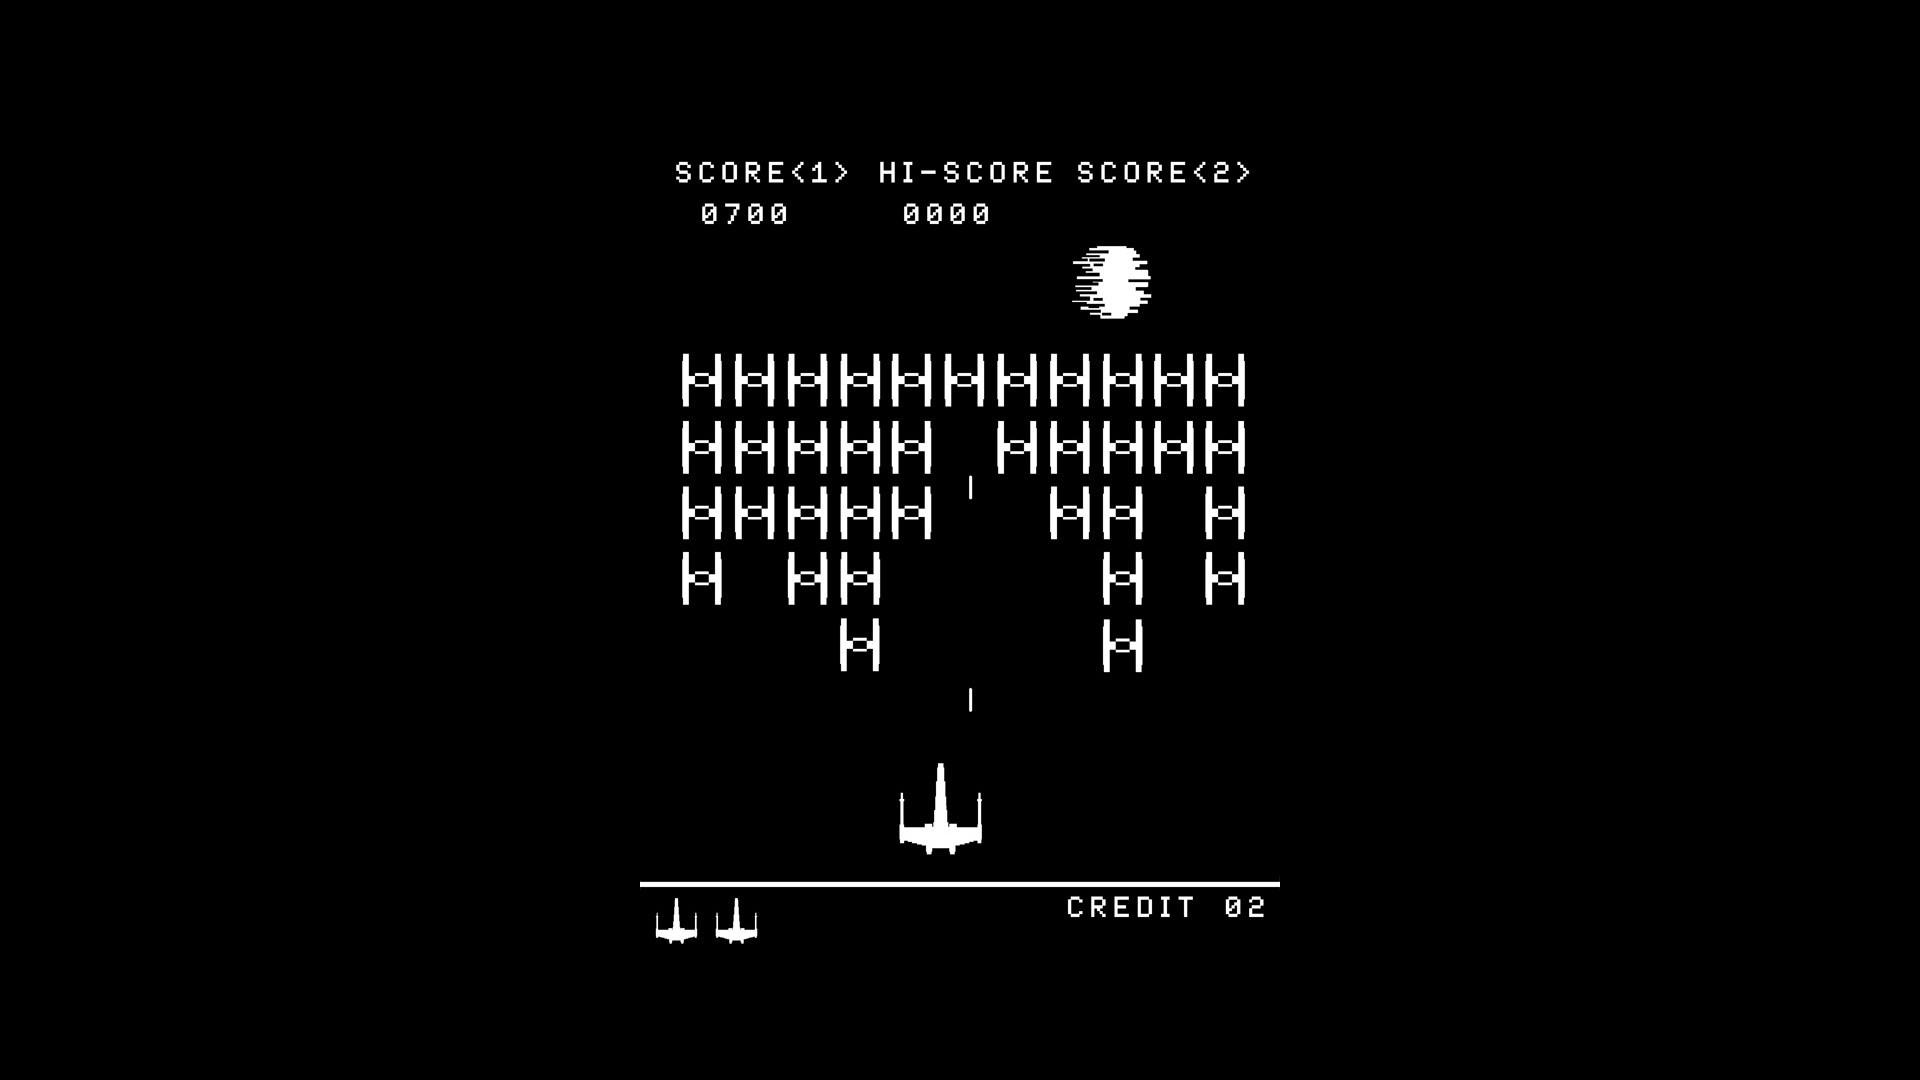 Abstract star wars arcade death star video space invaders atari .